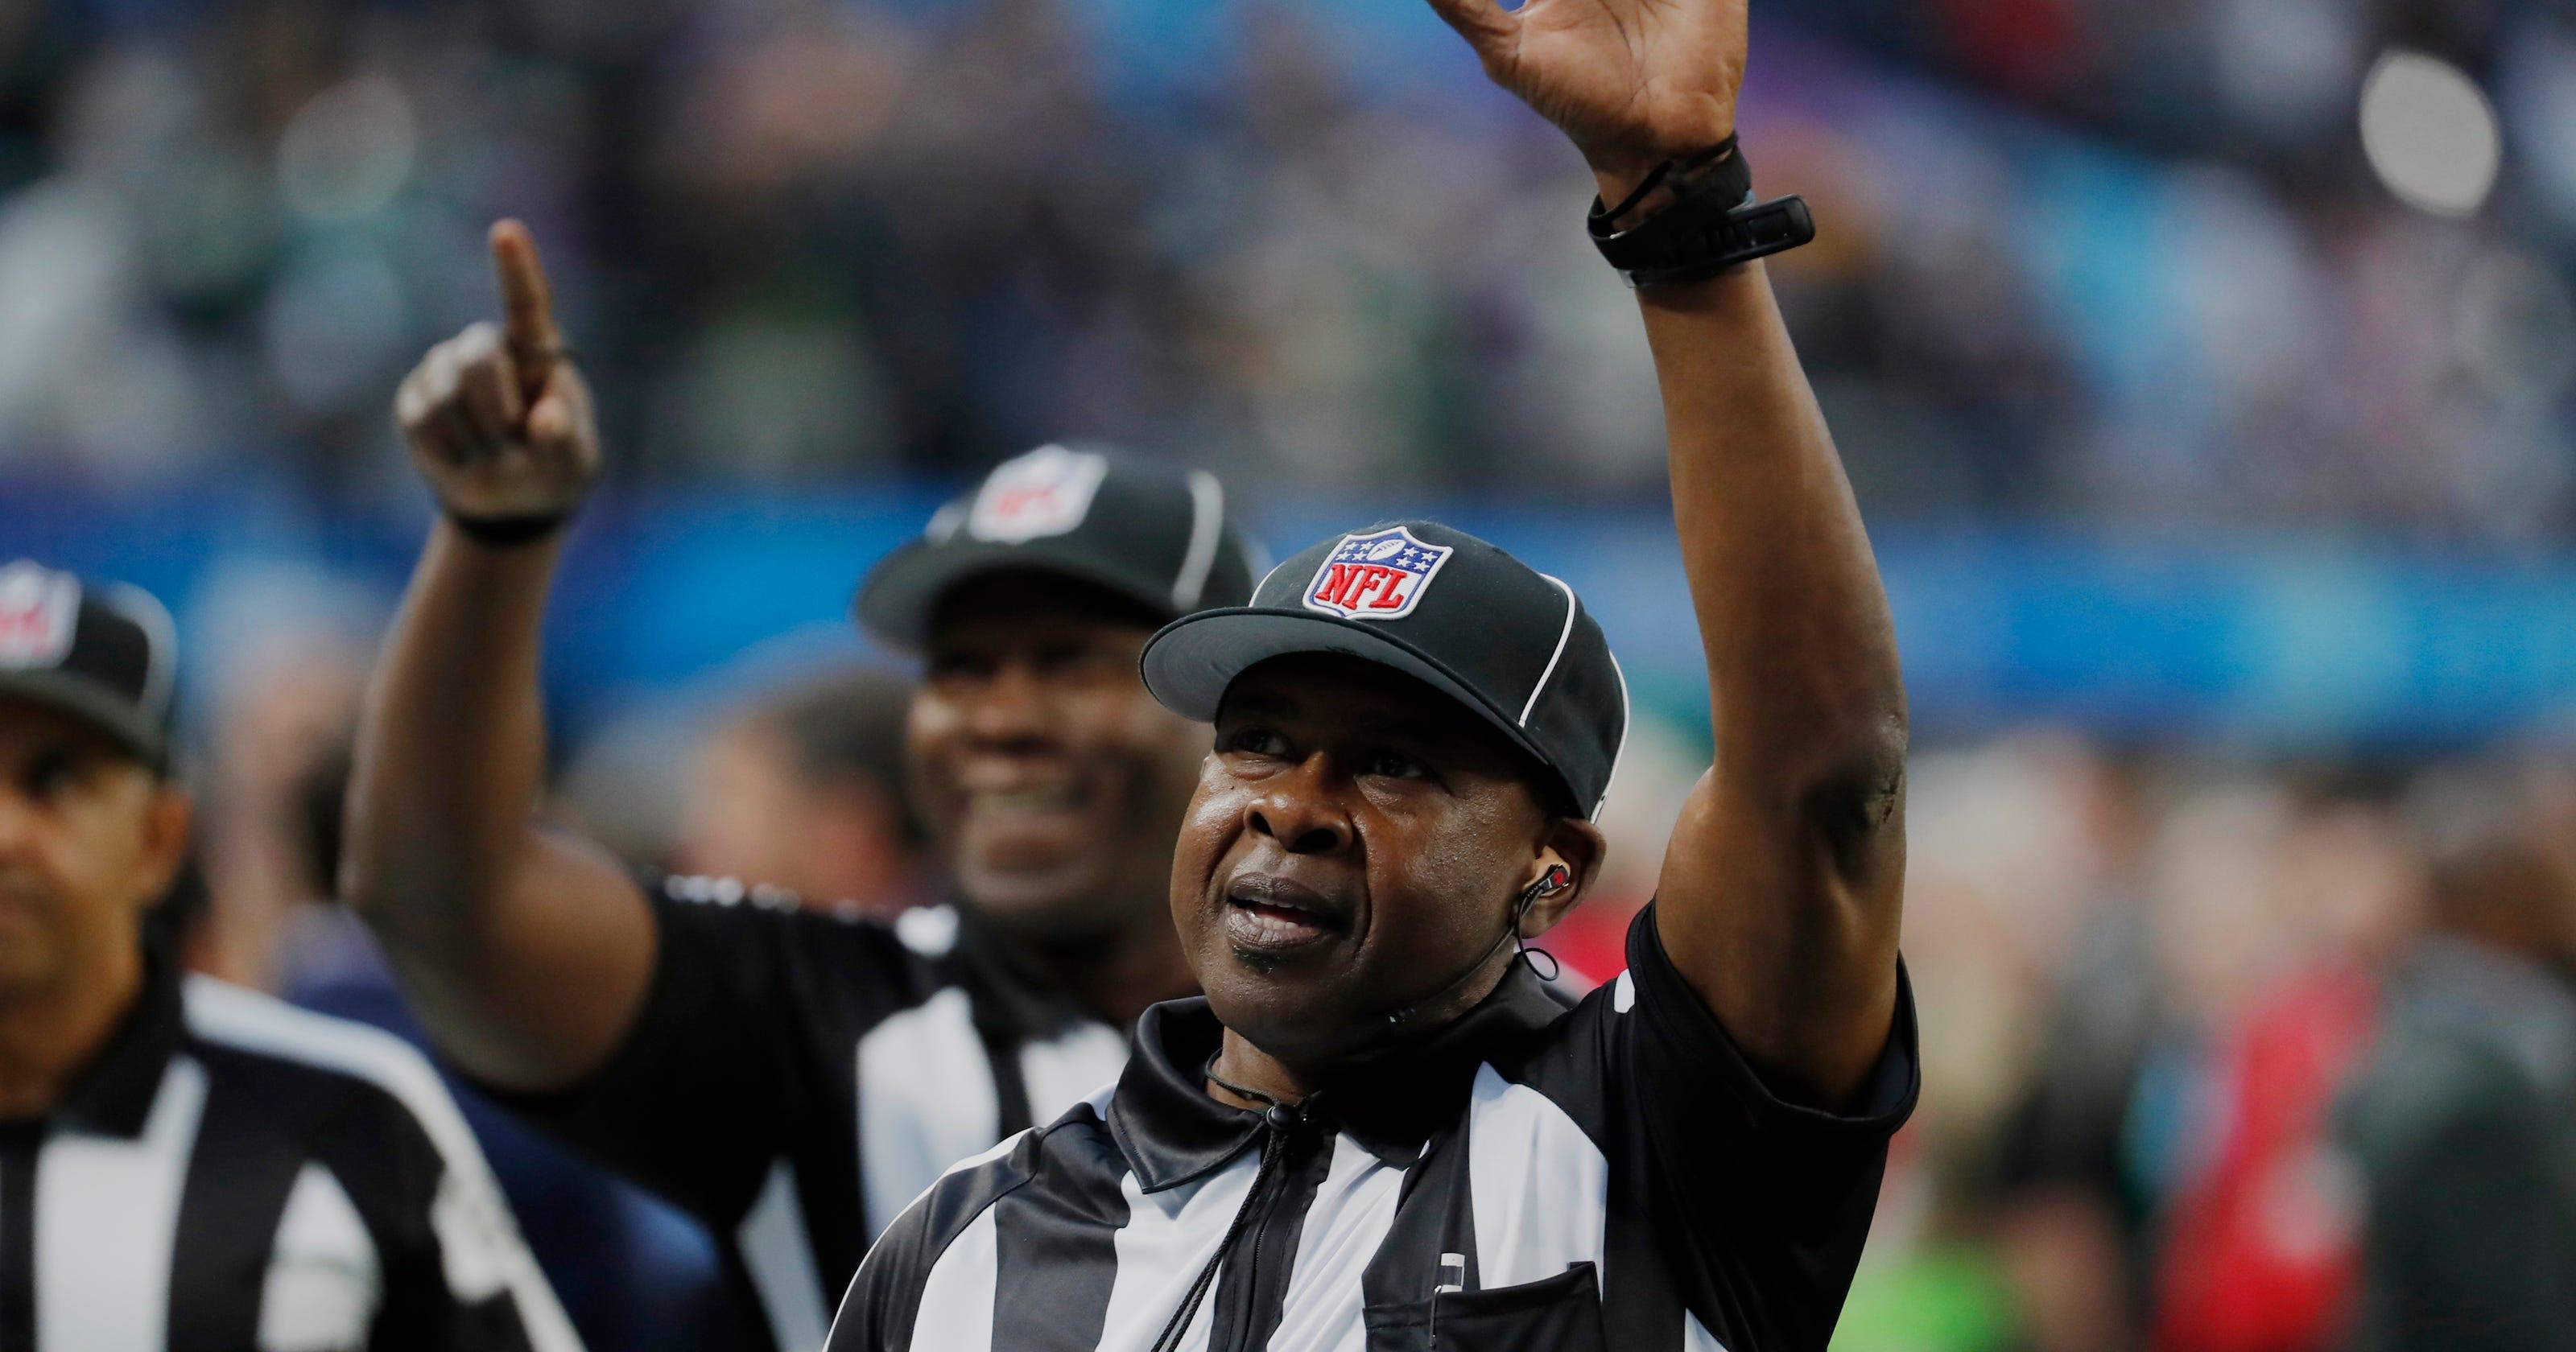 AP source: NFL fines umpire $9,300, reinstates him